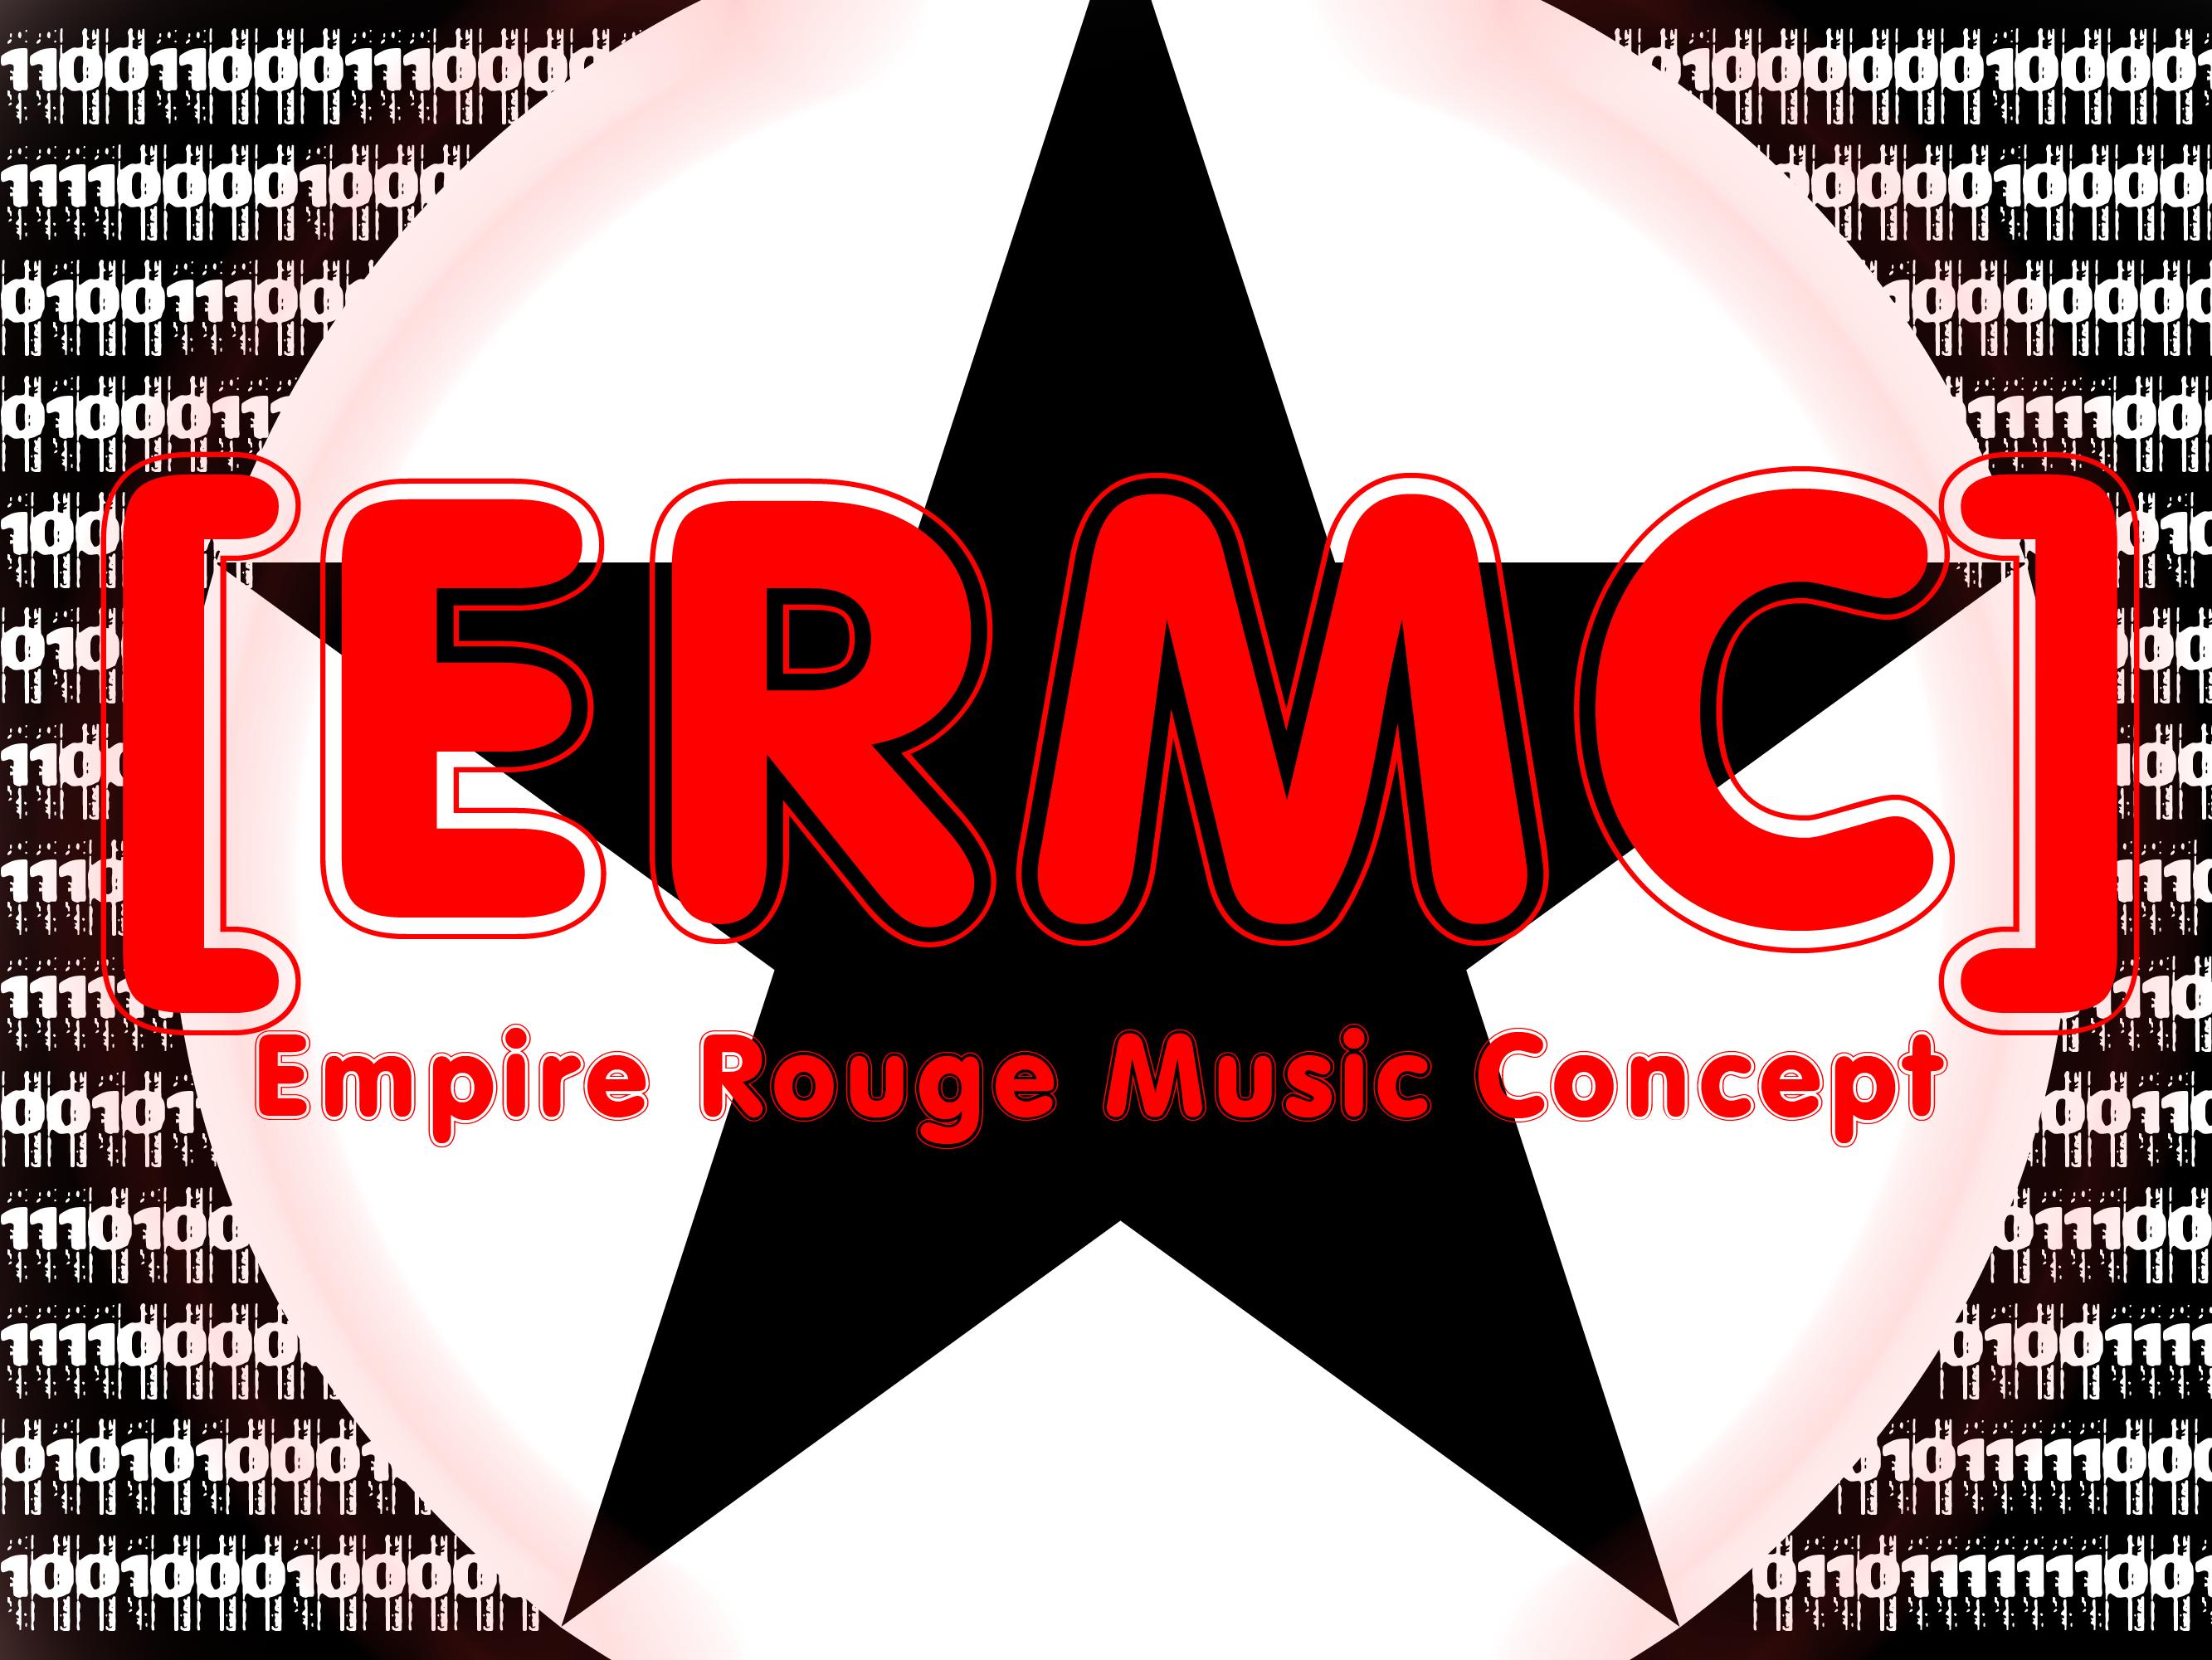 visit ermc.ogg